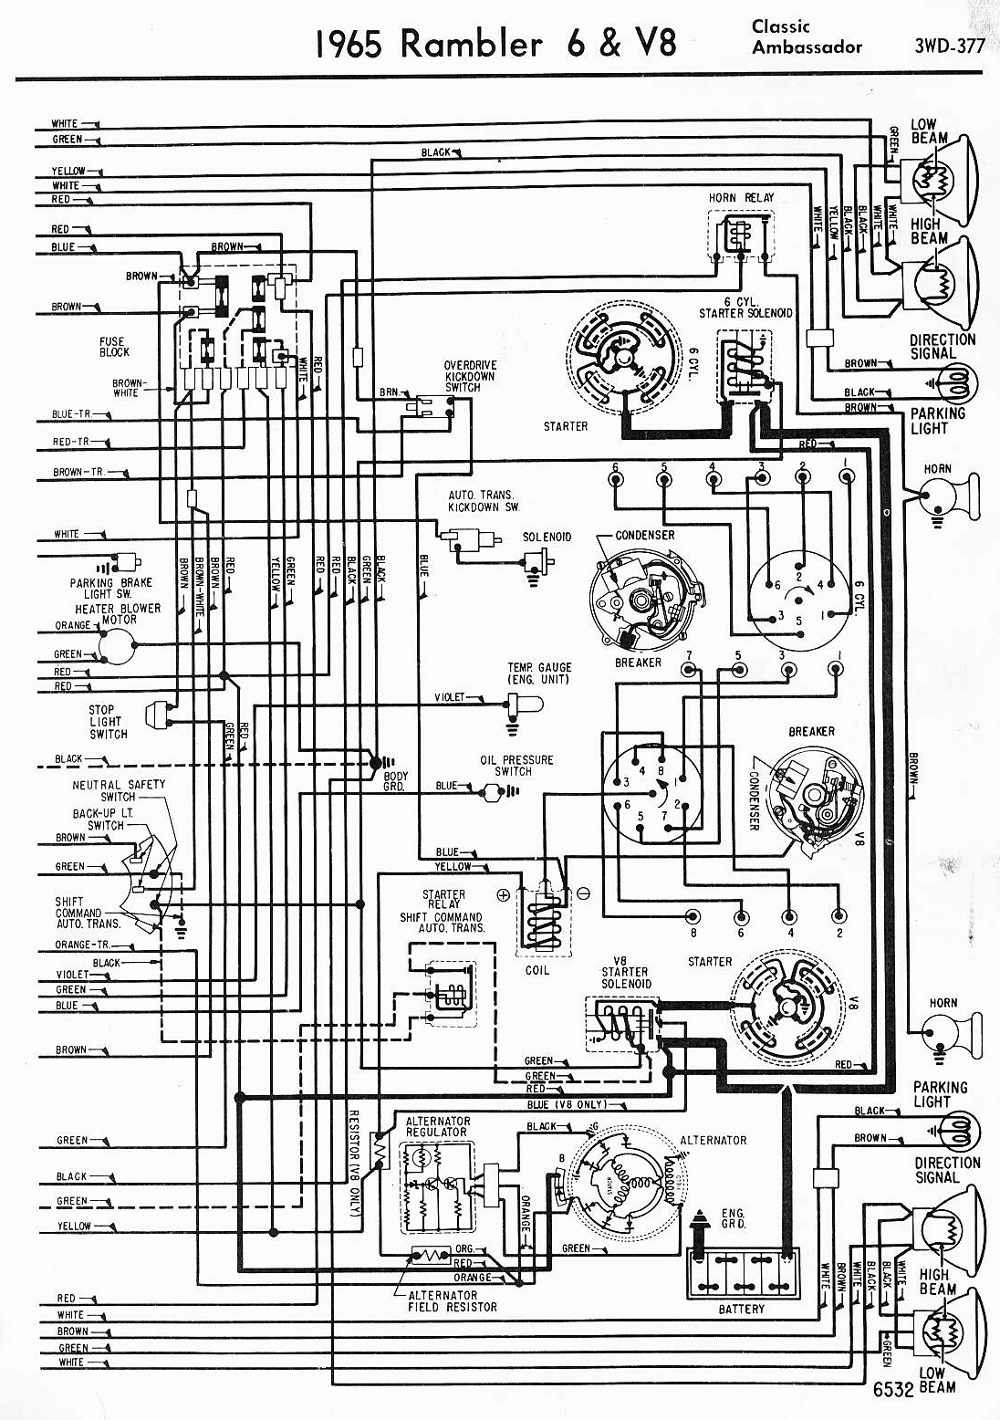 amccar wiring diagram wiring diagrams lol